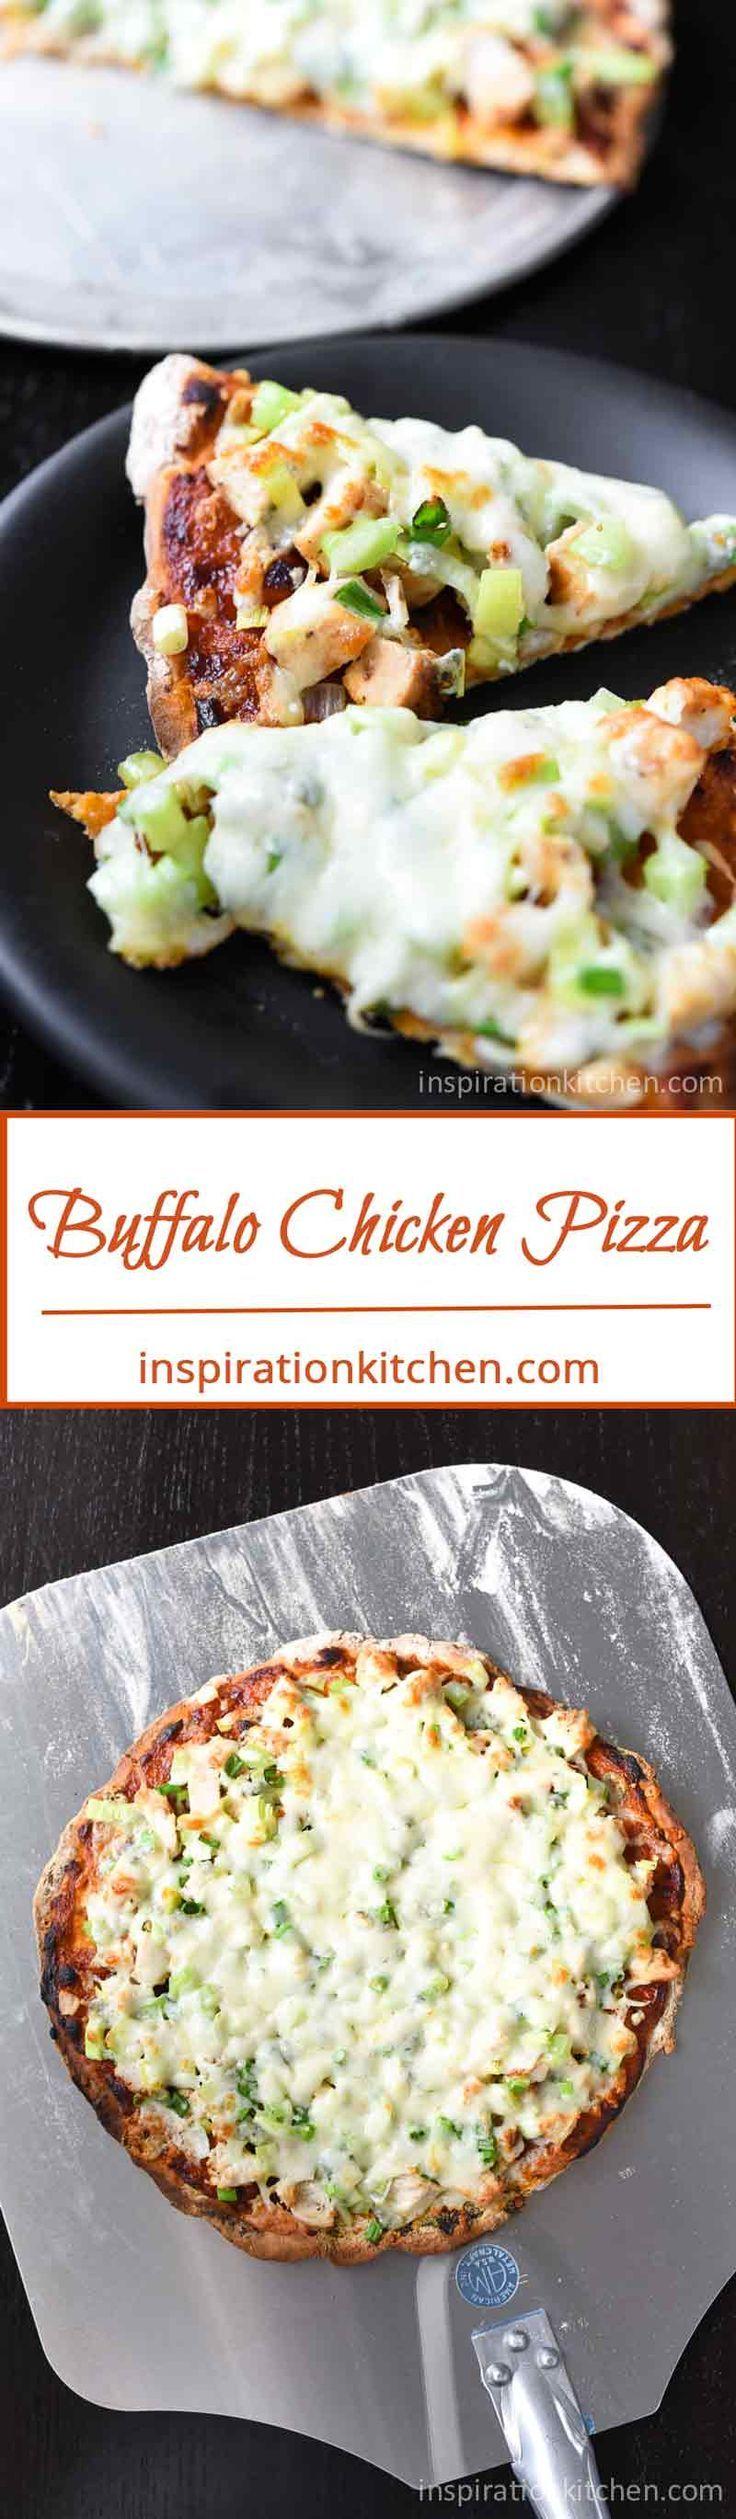 Buffalo Chicken Pizza | Inspiration Kitchen  #pizza #buffalochicken #recipe